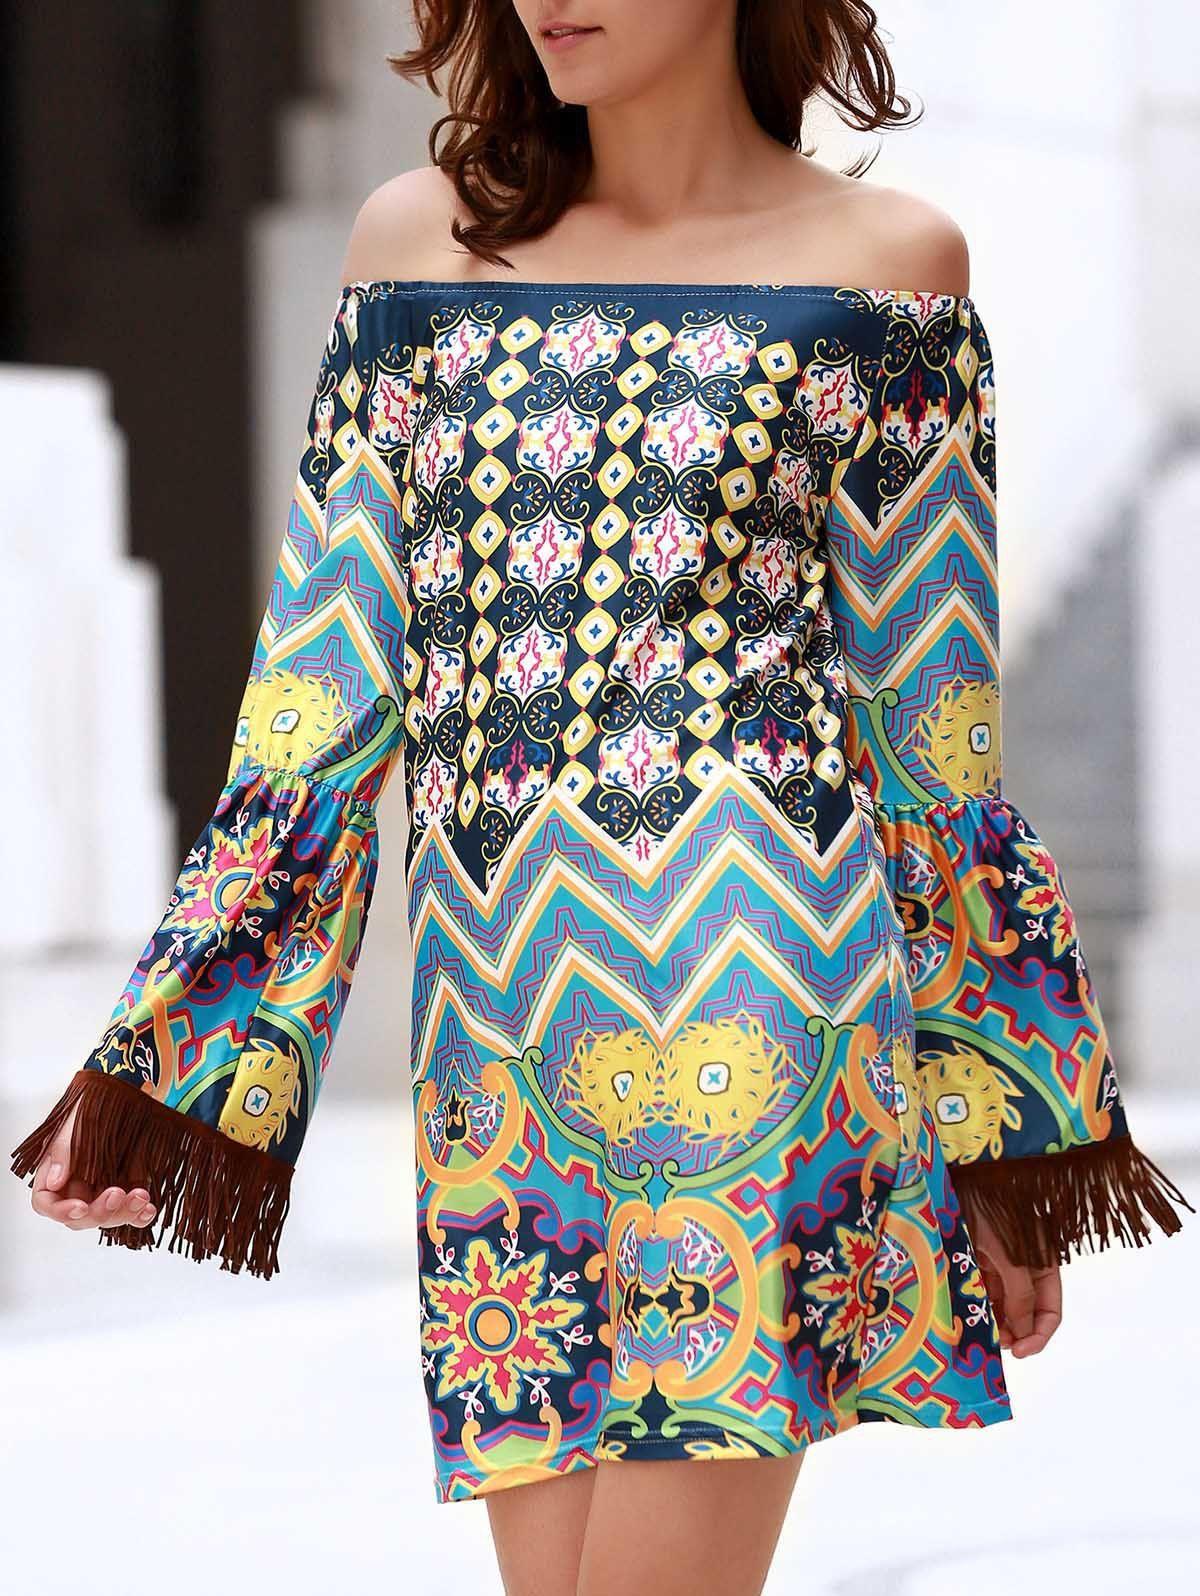 Bohemian off the shoulder ethnic print fringed dress for women